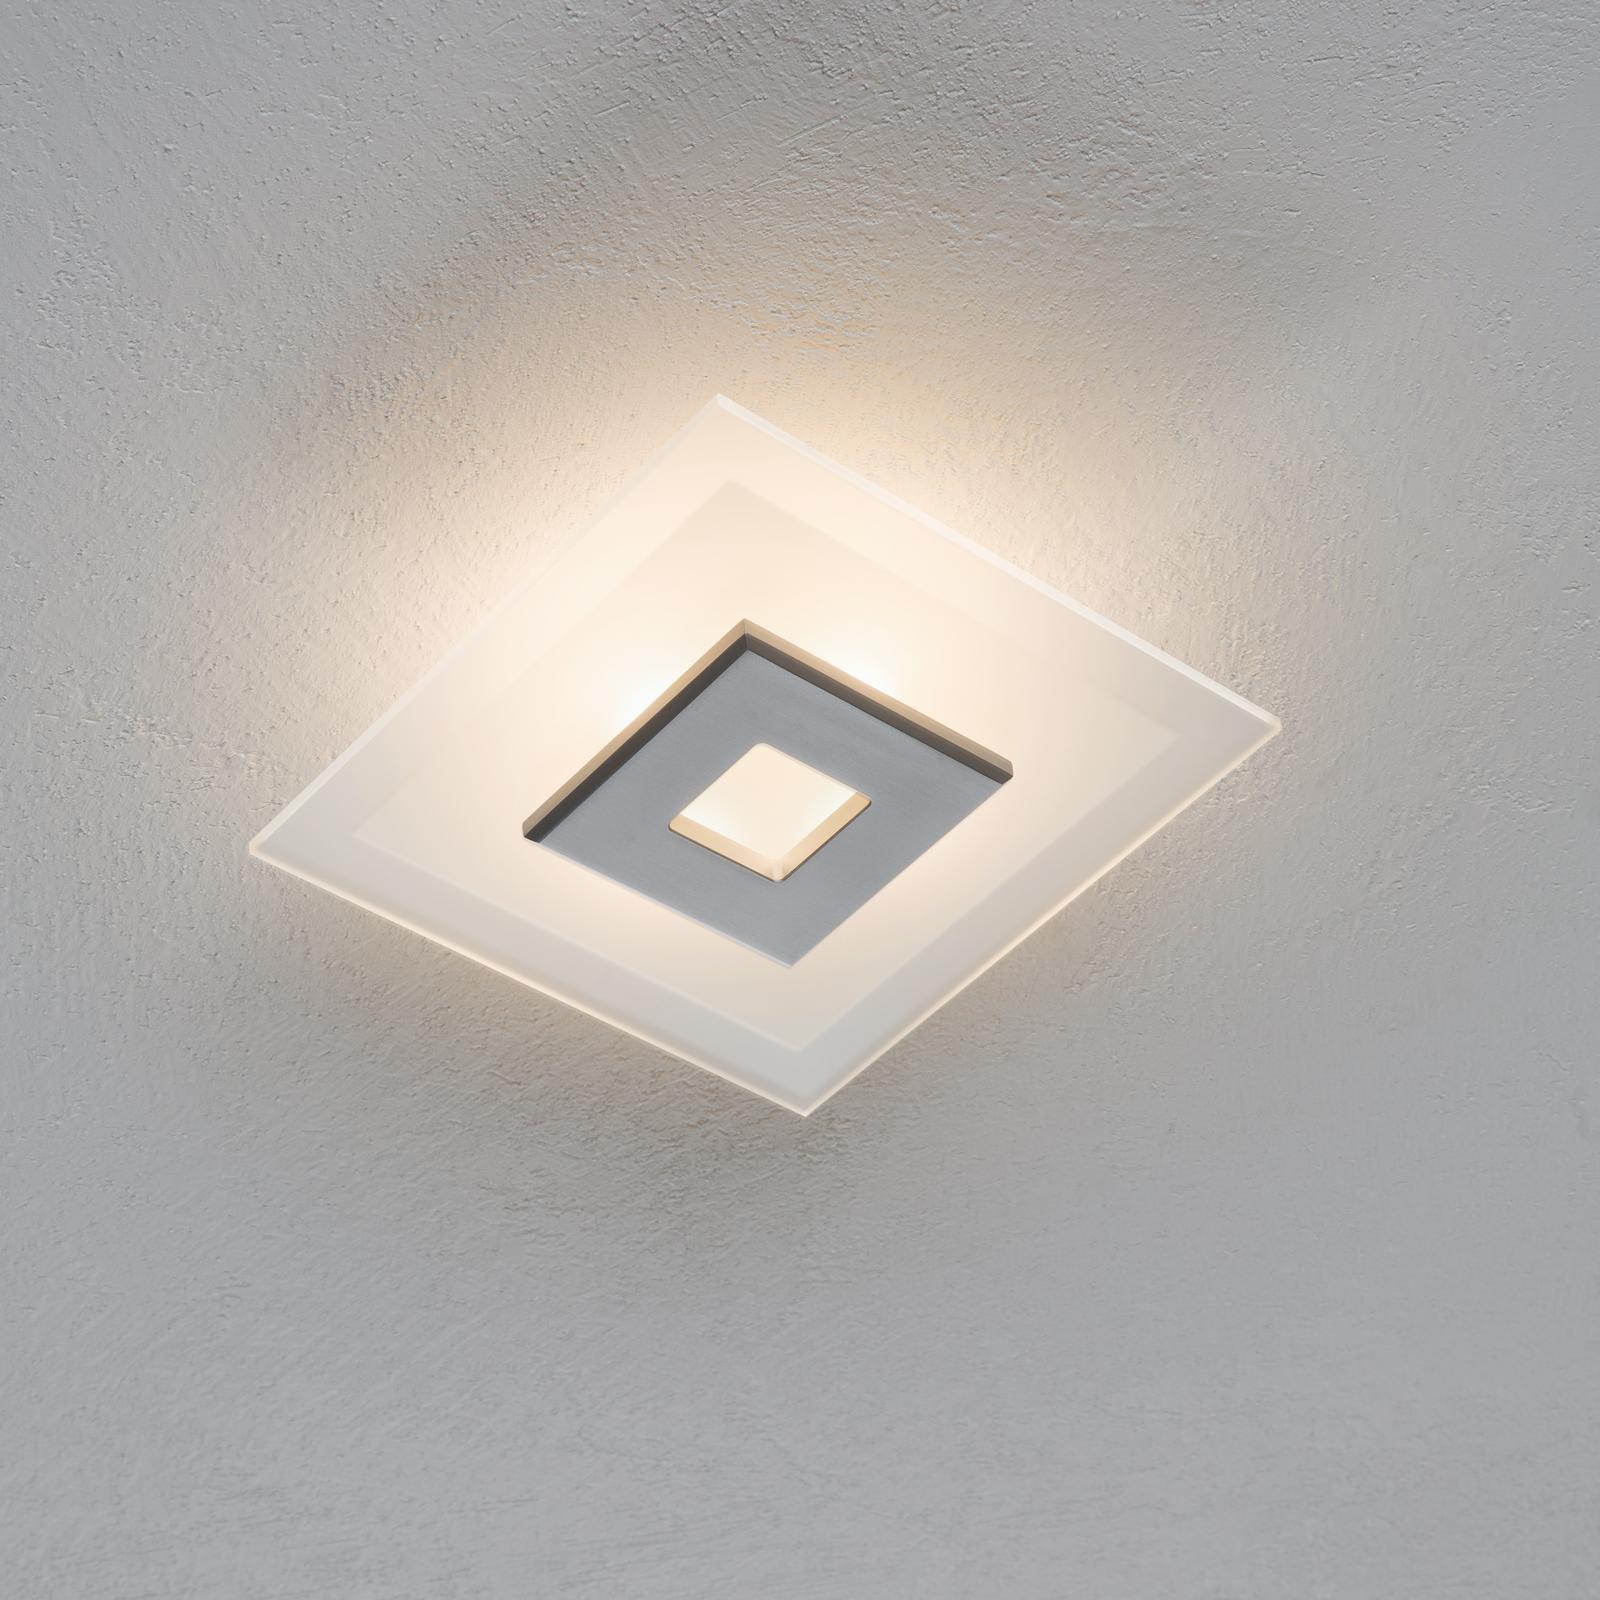 LED plafondlamp Tian met glazen kap, 25 cm